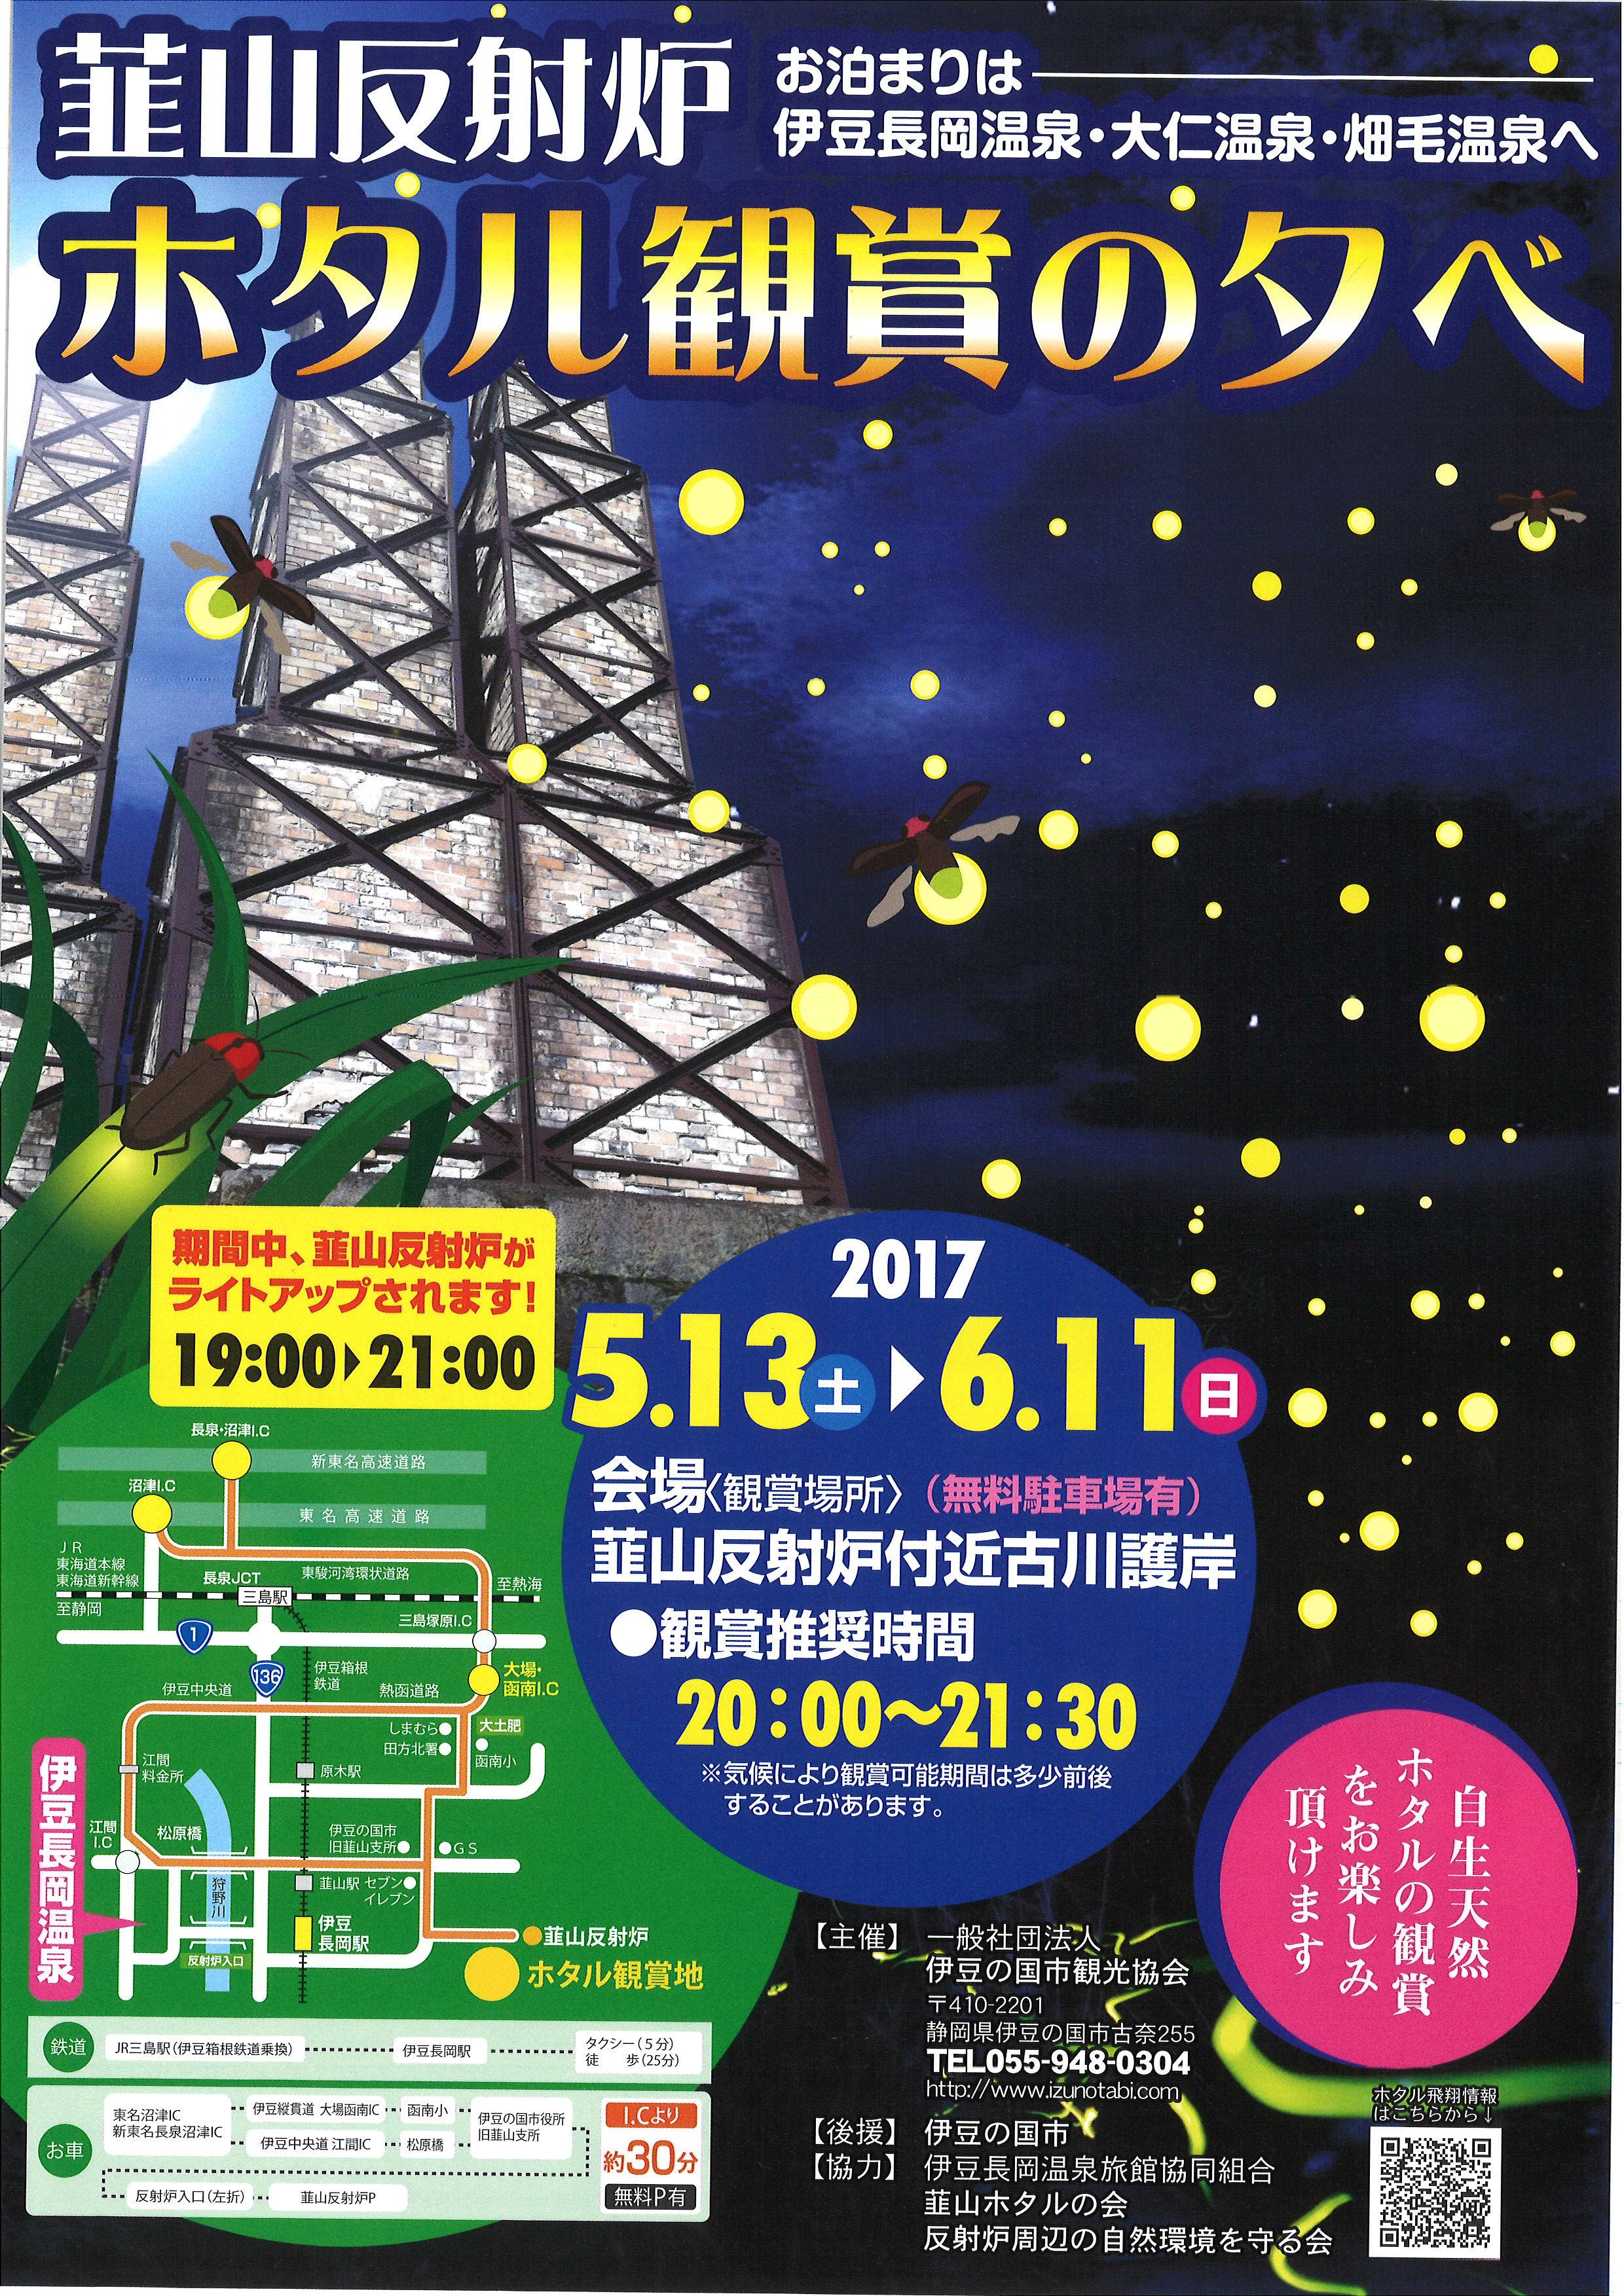 align:none link:0 alt:0 Firefly Festival 2017 - Nirayama Reverberatory Furnace (5/13 - 6/11)l